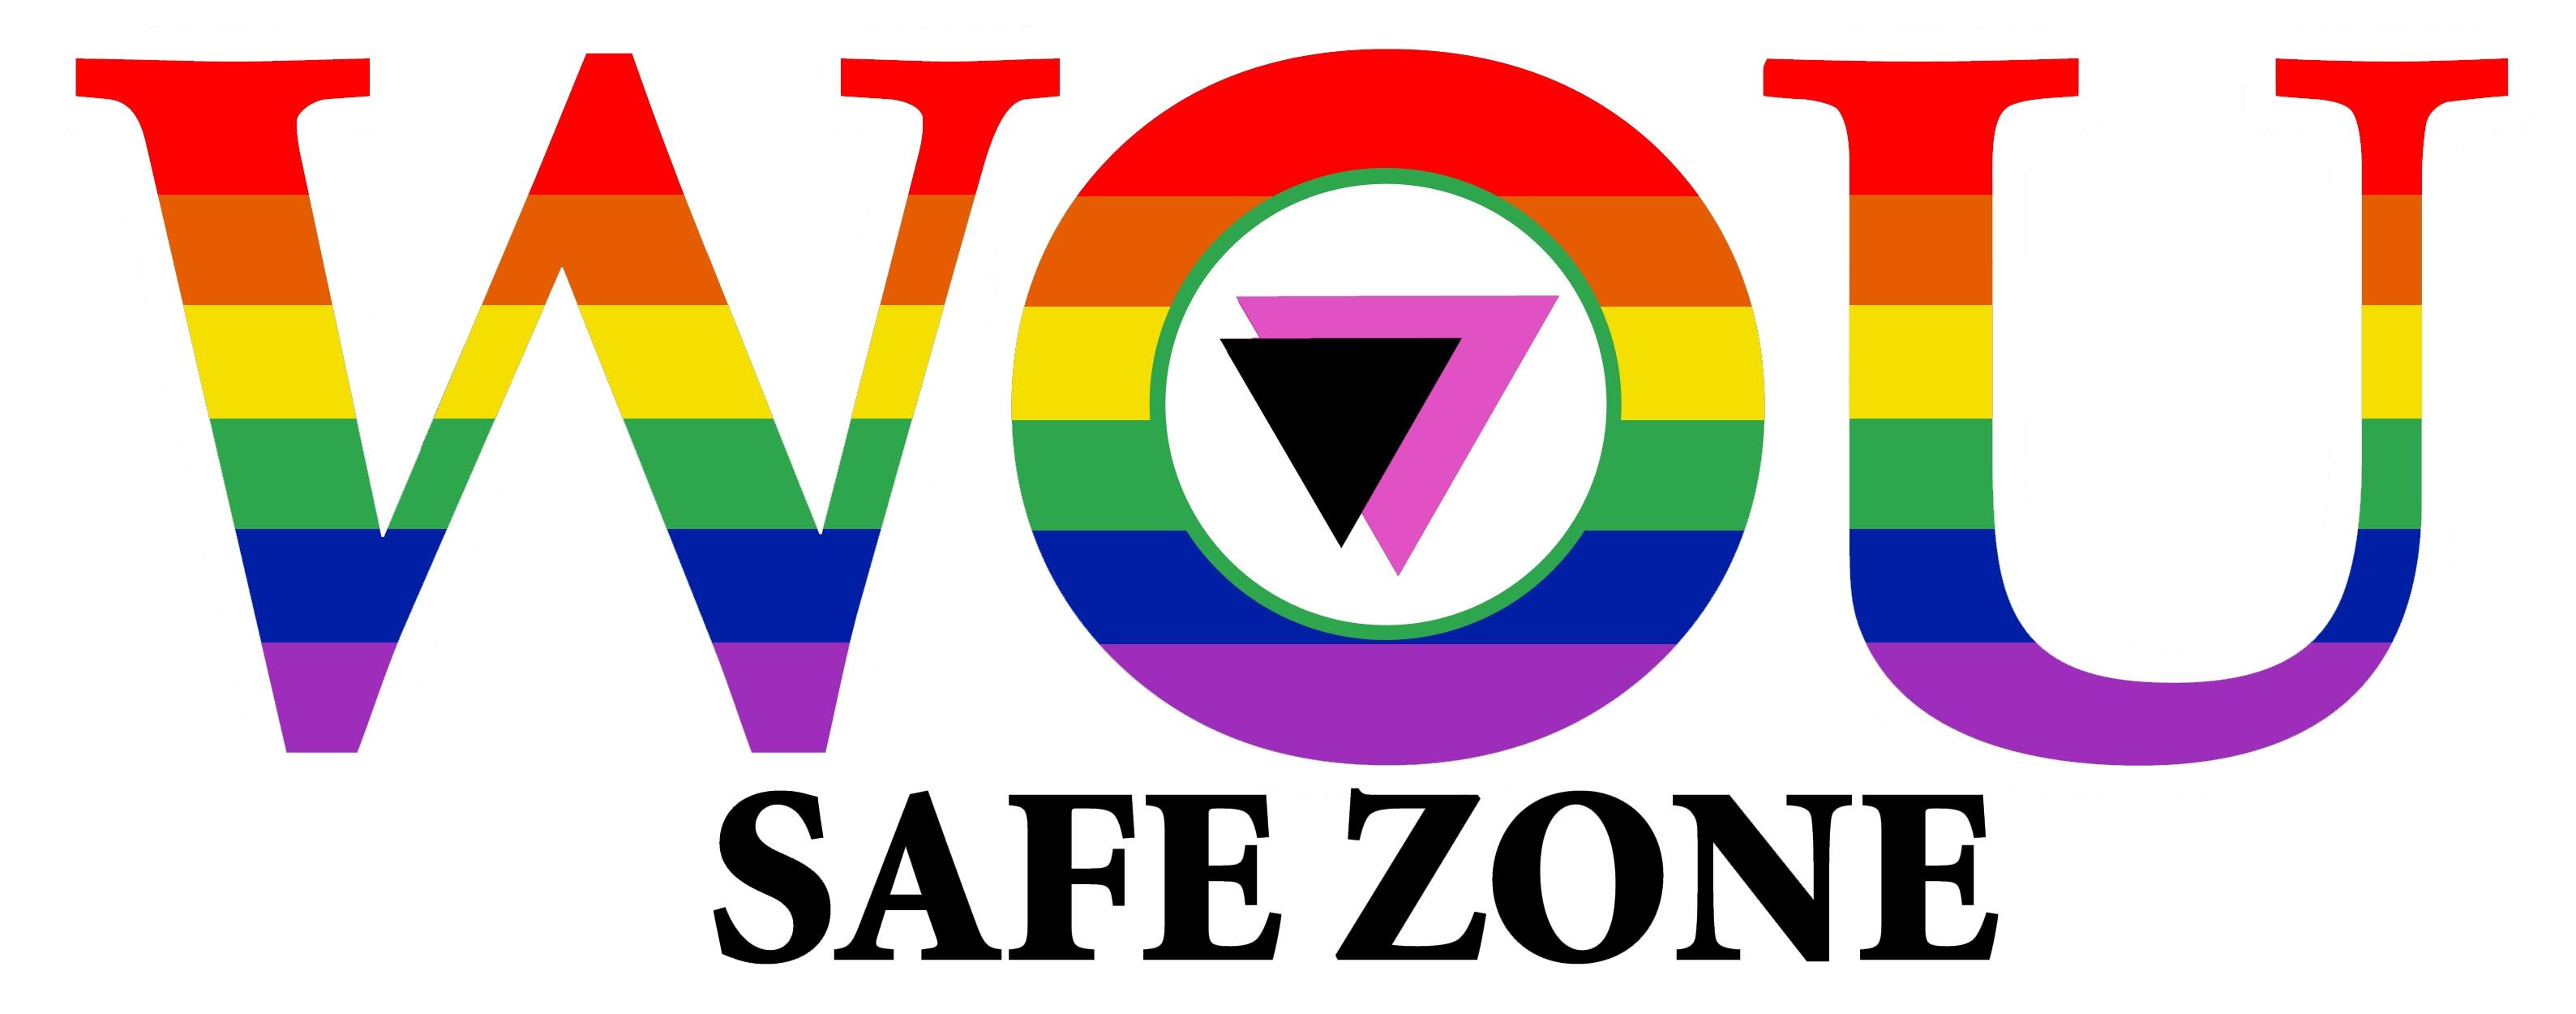 Ally 1 Training Safe Zone